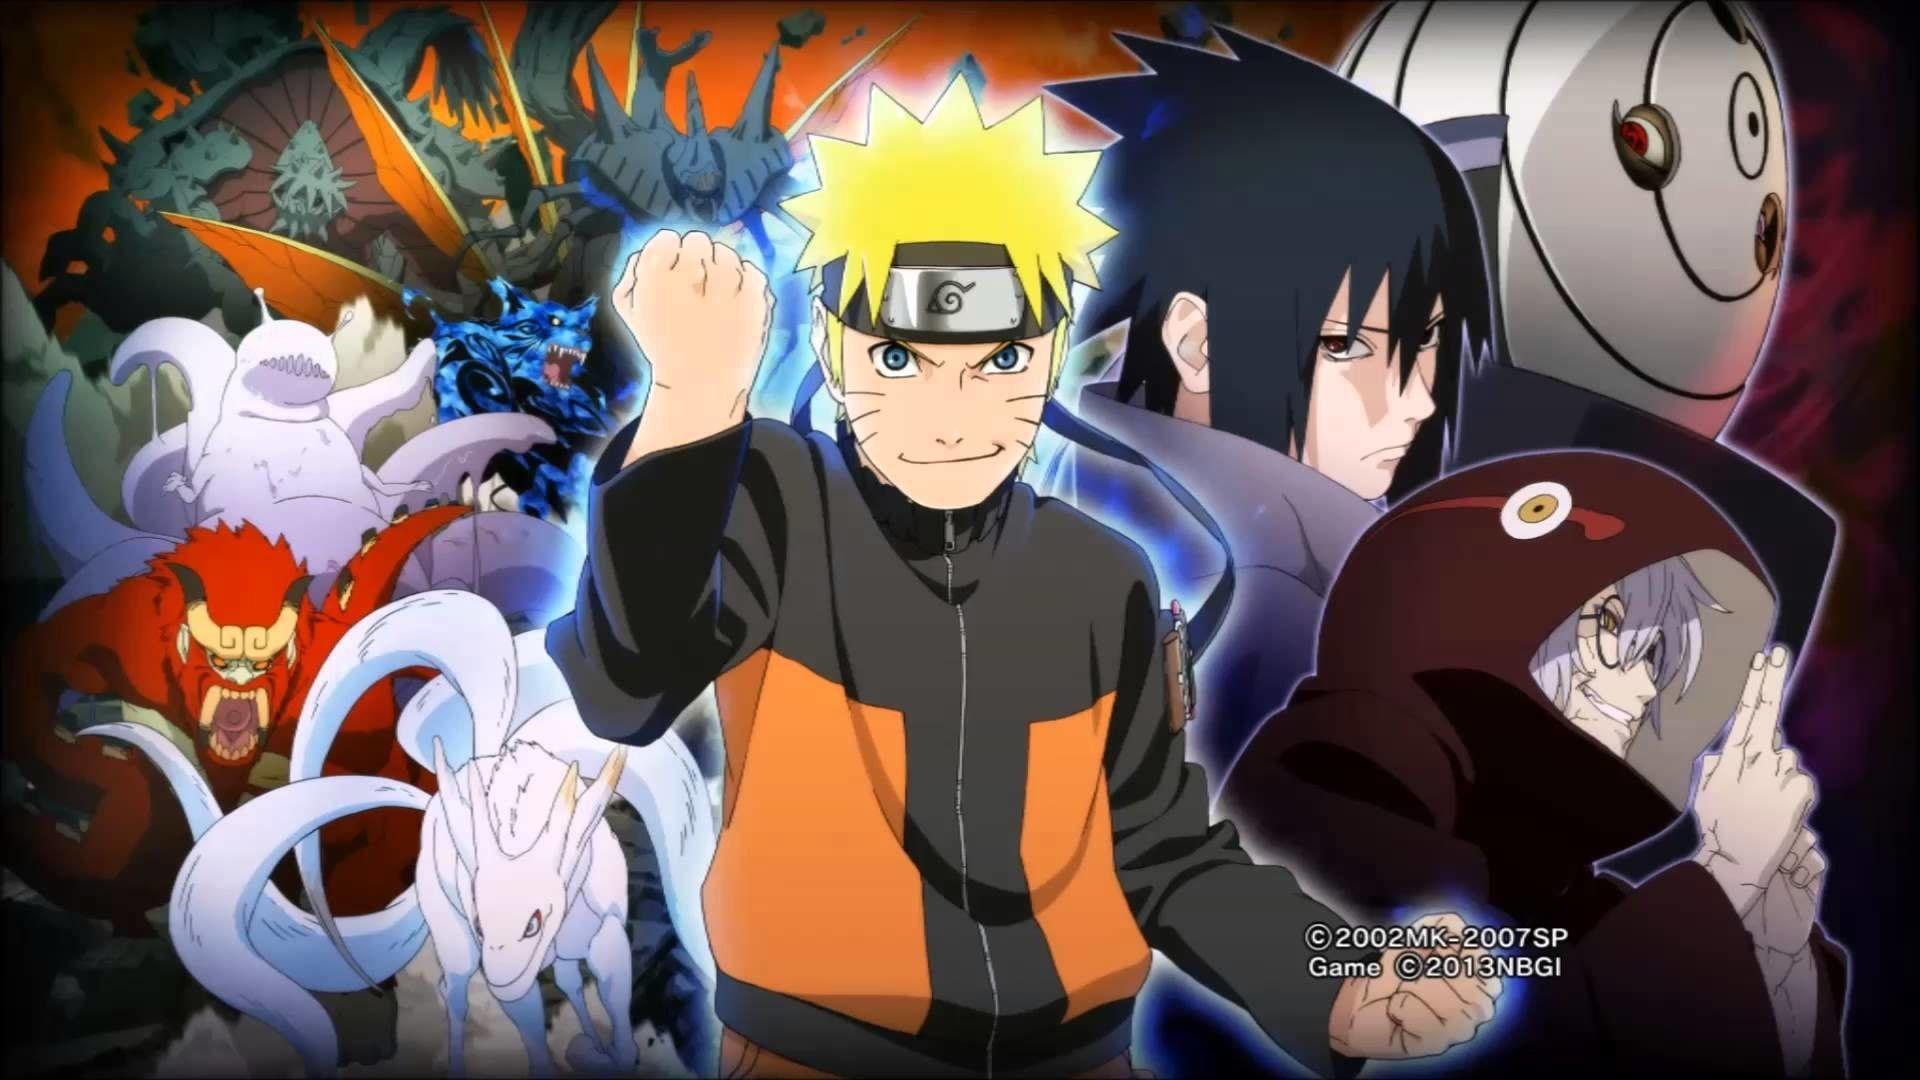 Naruto Wallpaper For Ps4 Unique Wallpapers De Naruto Shippuden Hd 2018 A Wallpaper Naruto Shippuden Naruto Wallpaper Anime